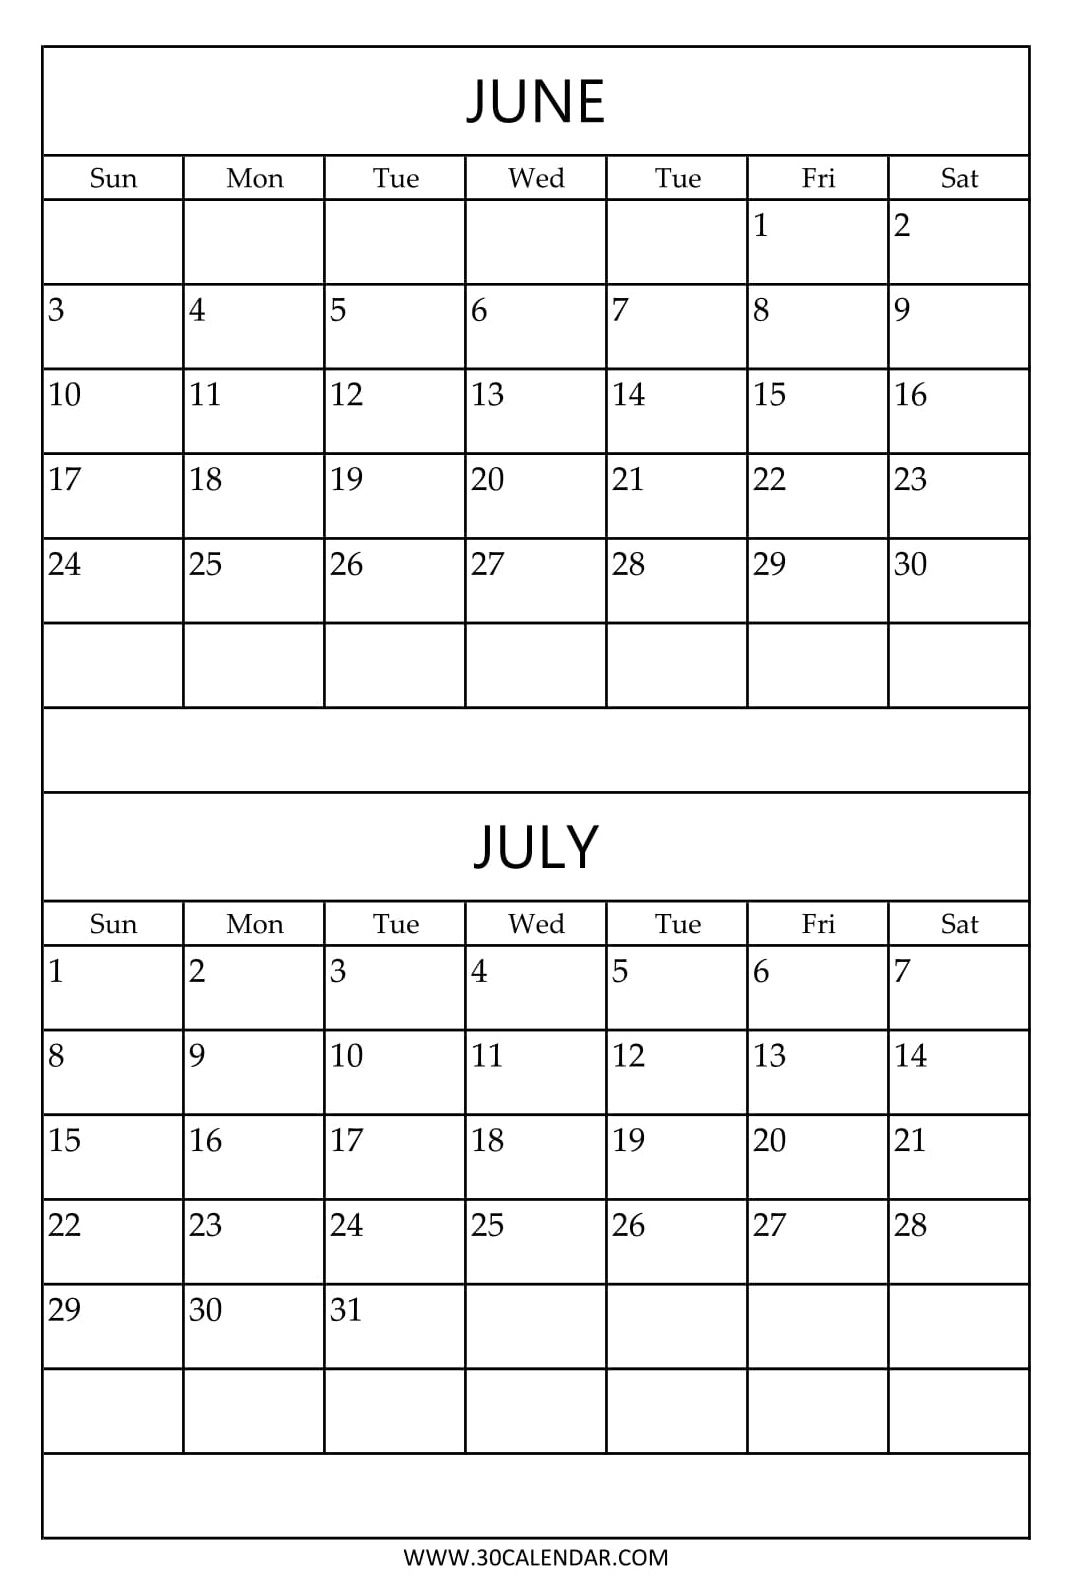 Free Printable June July Calendar Template | 2018 Calendar | July inside Printable Weekly Calendar Template July